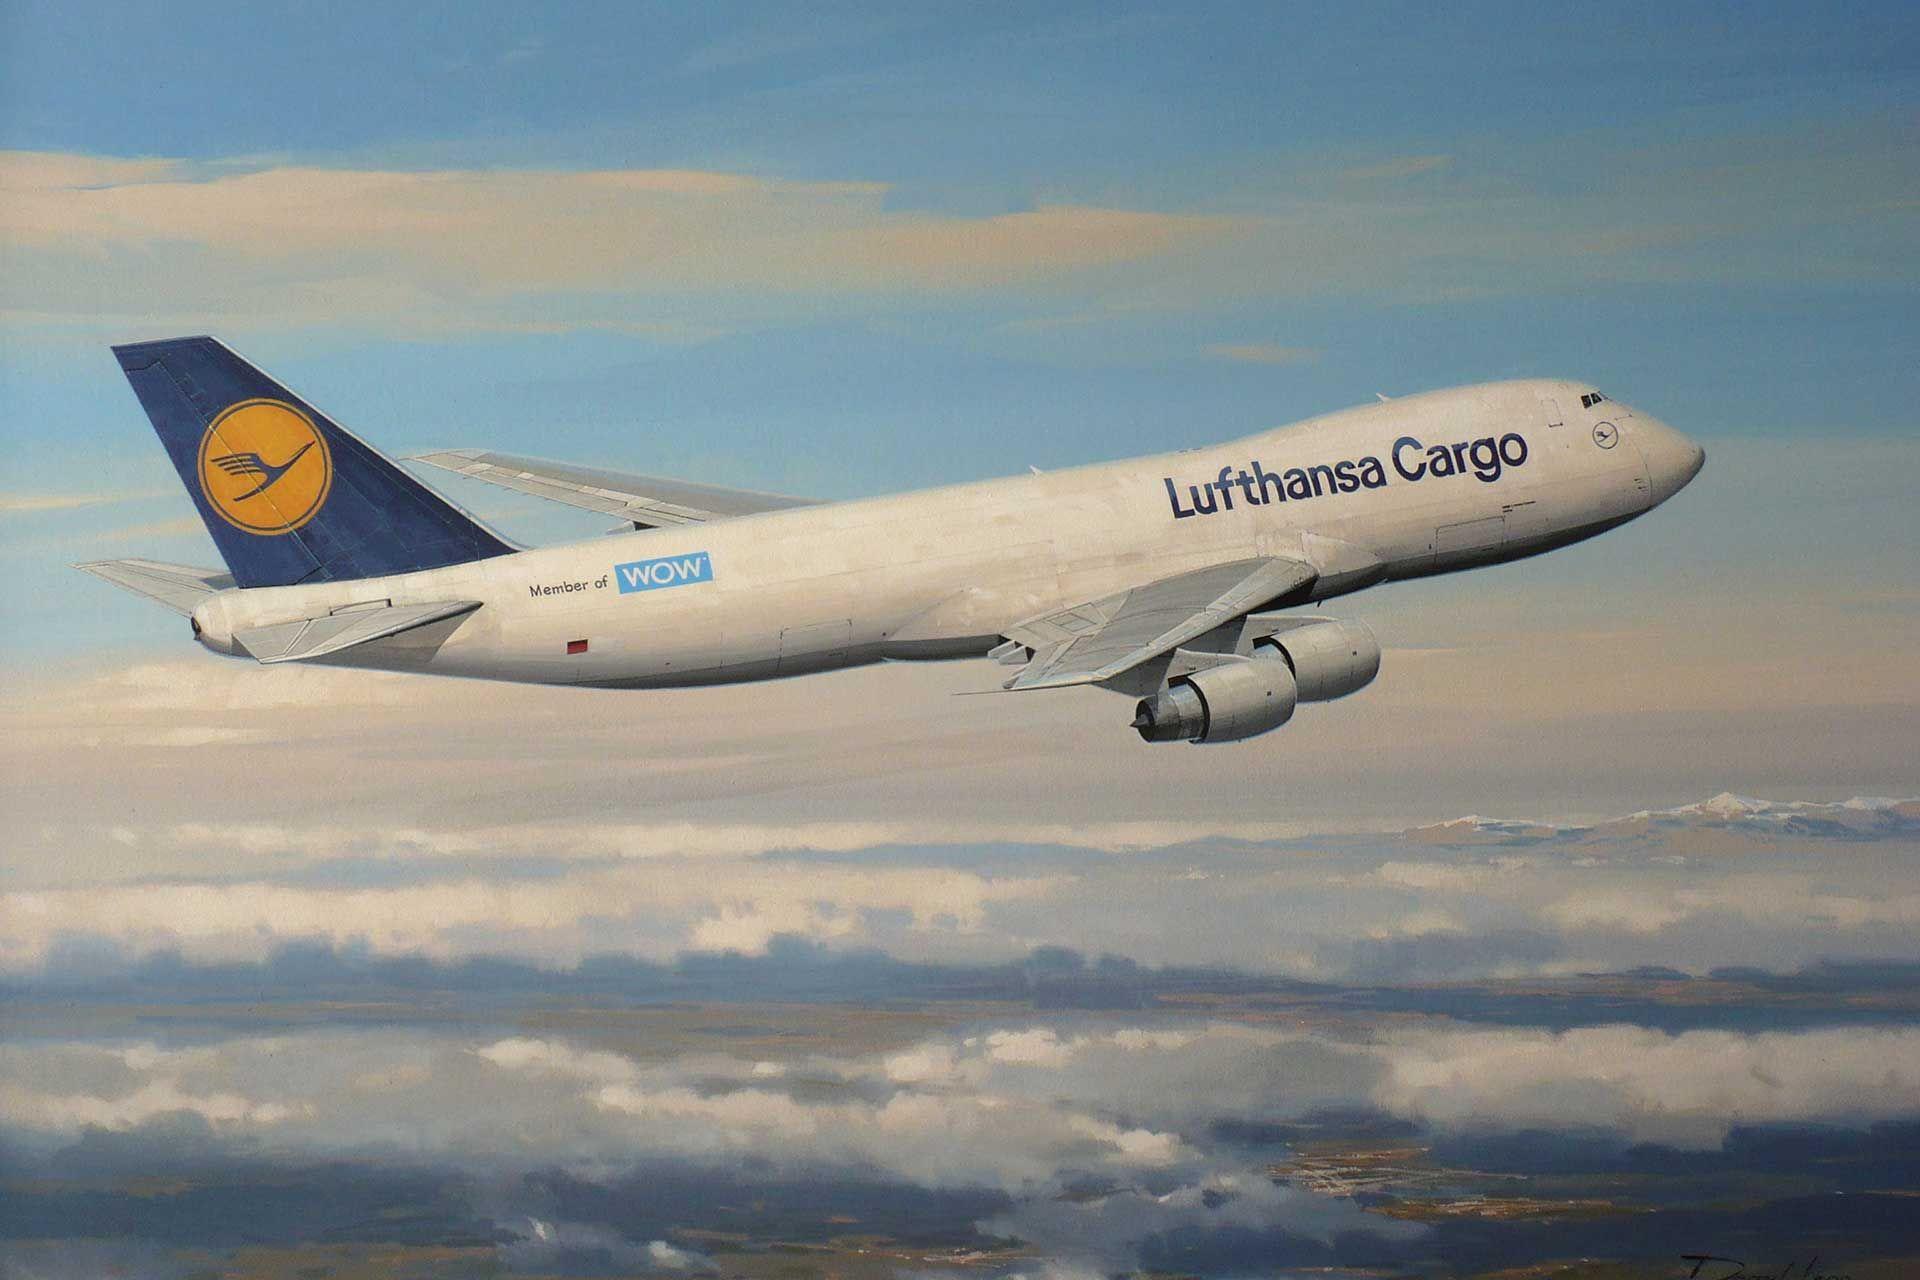 Boeing 747-230F A cargo laden Lufthansa Boeing 747 freighter climbs through the broken cloud en route to France.